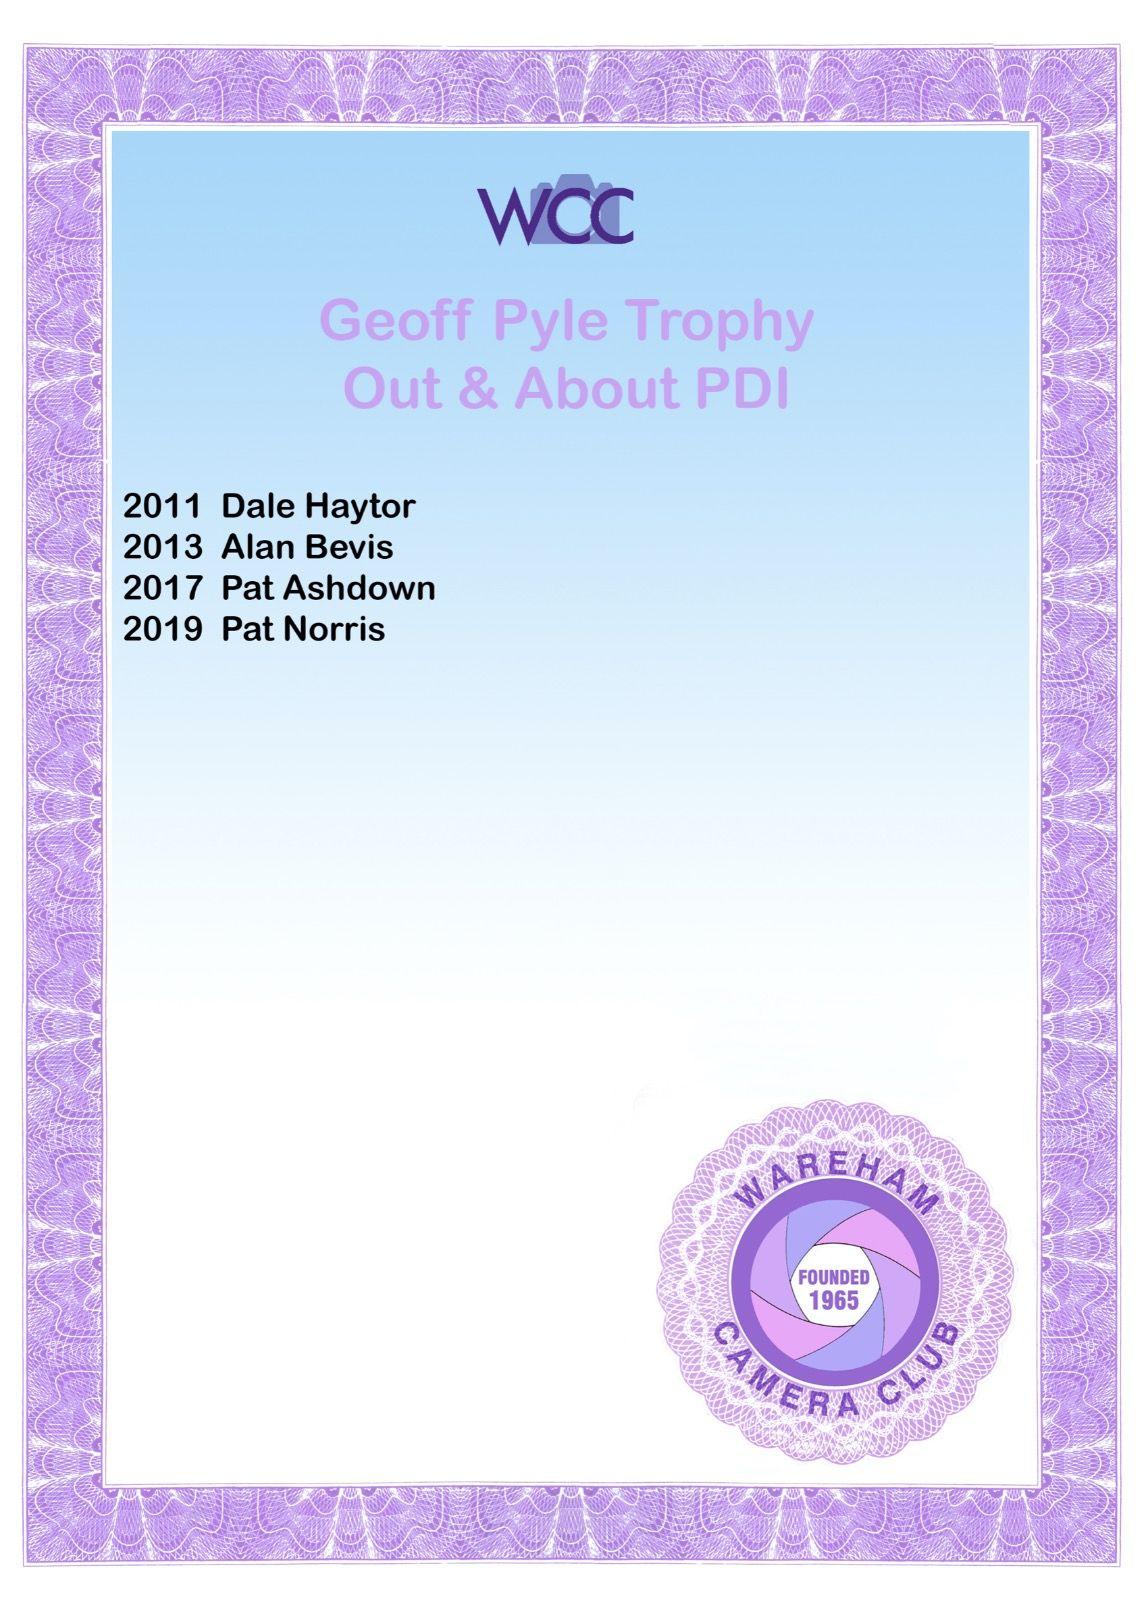 Geoff Pyle PDI 2